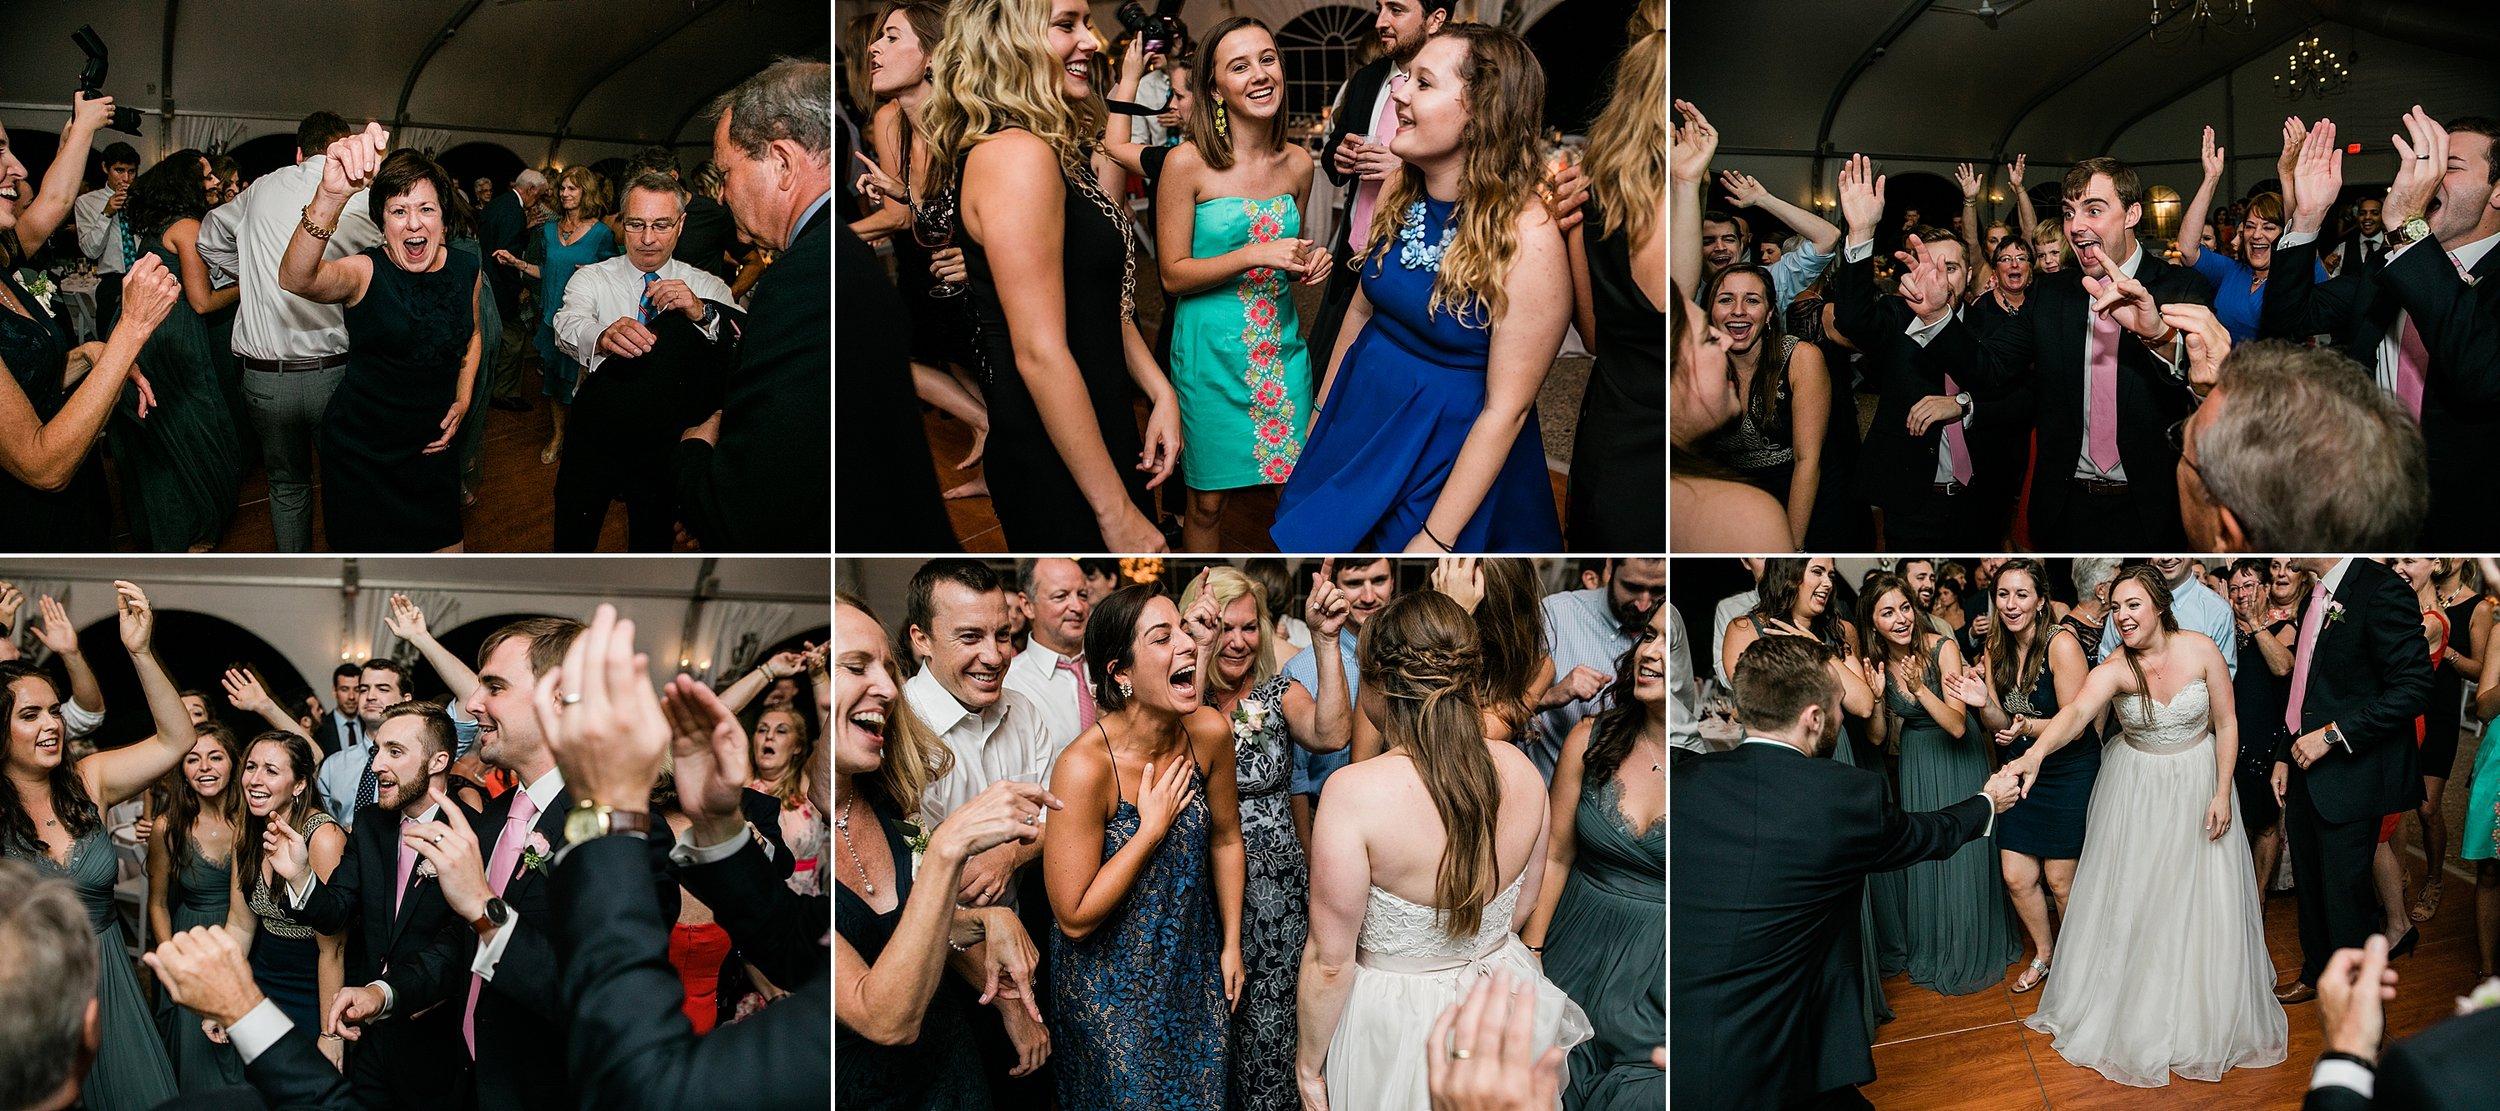 046 los angeles wedding photographer todd danforth photography boston.jpg